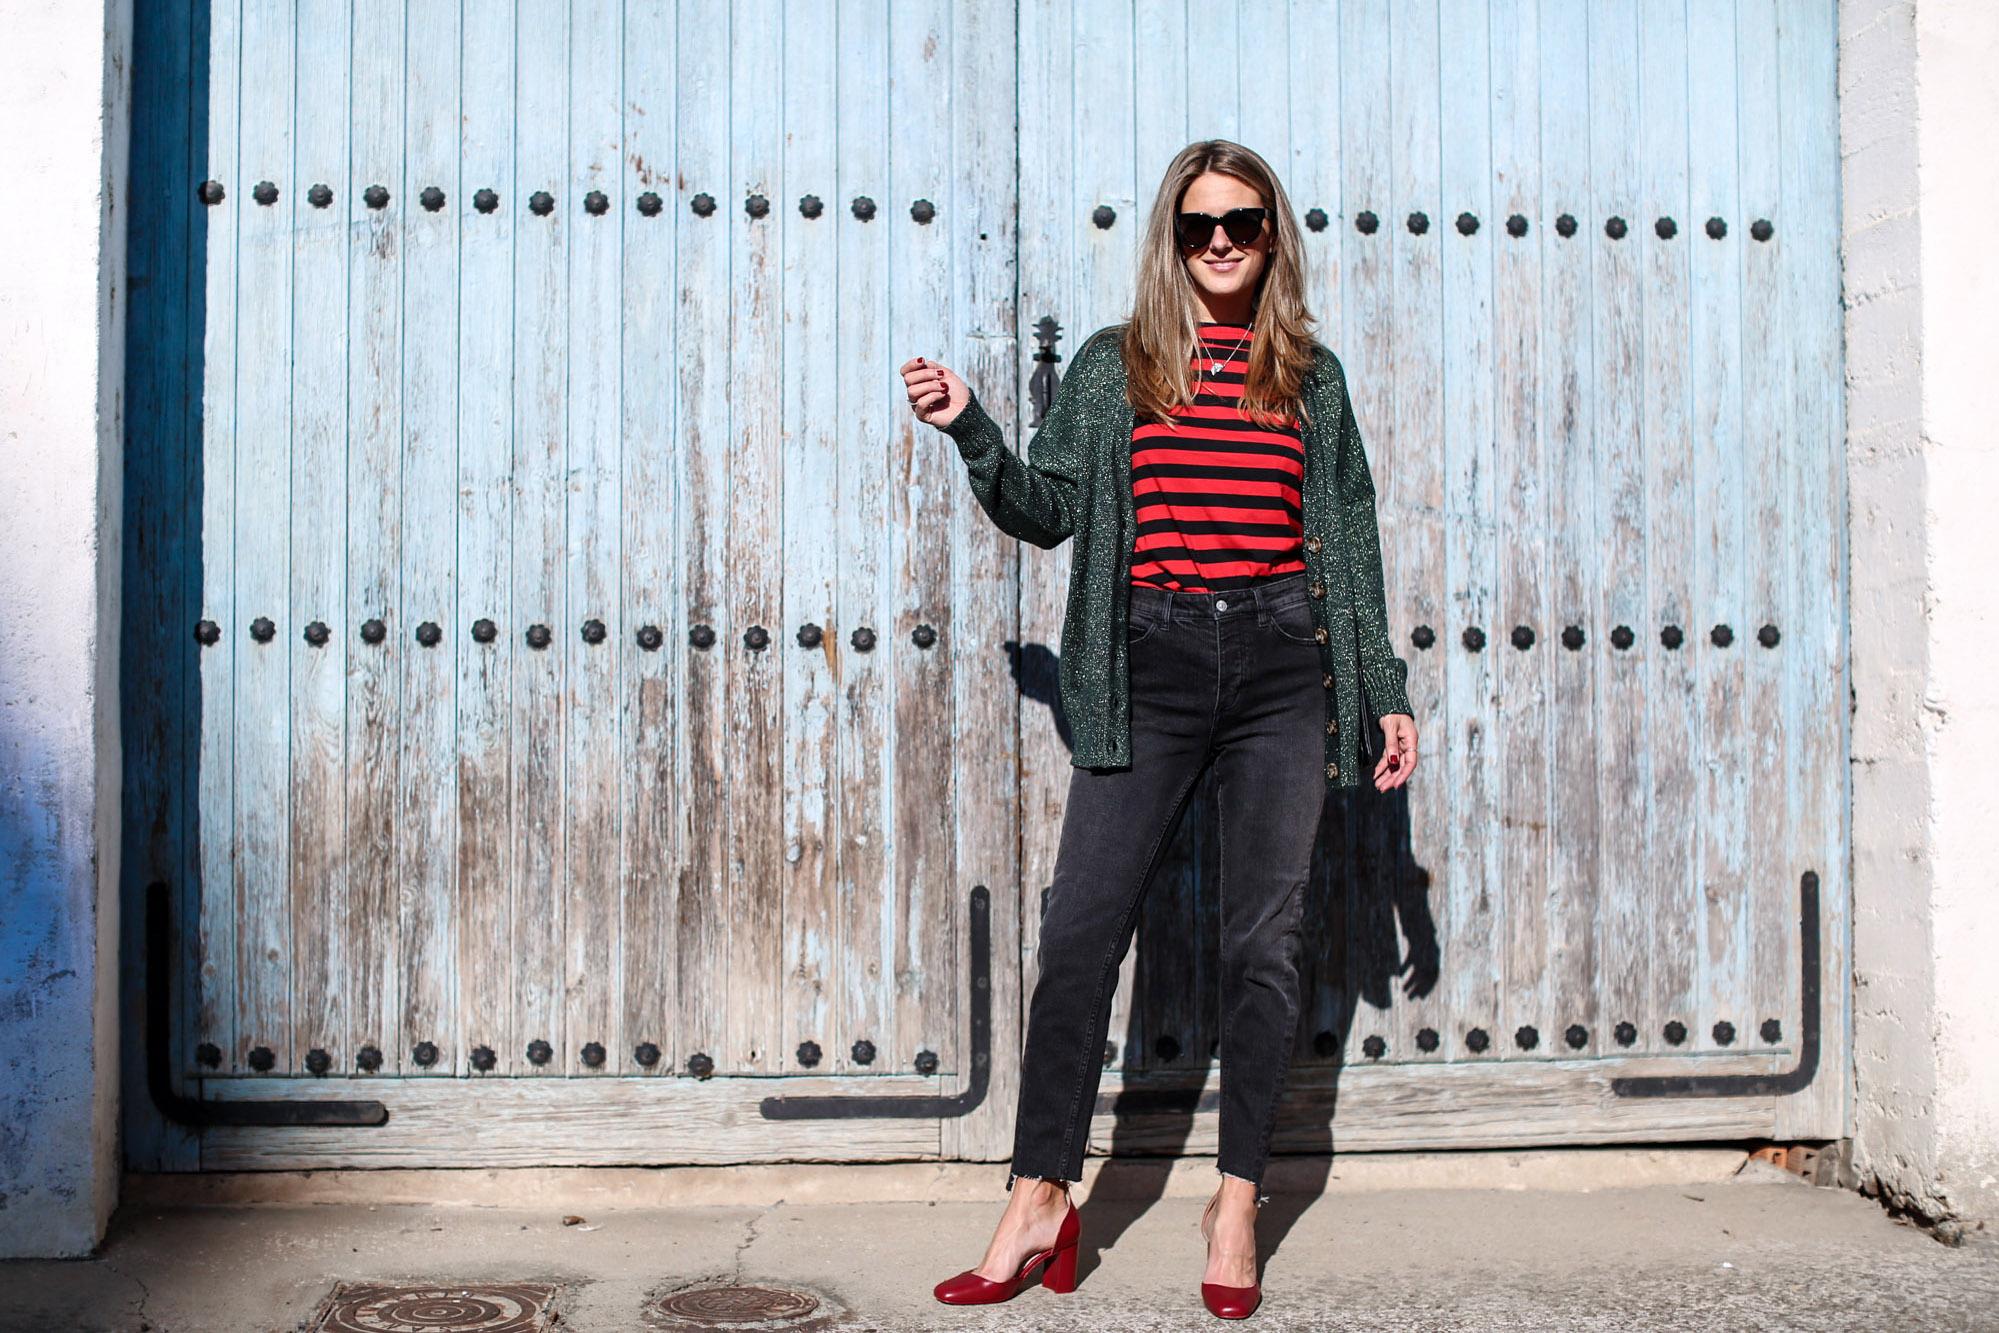 clochet_streetstyle_fashionblogger_zapatostaconrojospielzara_bolsotrioceline_momjeansh&m-5